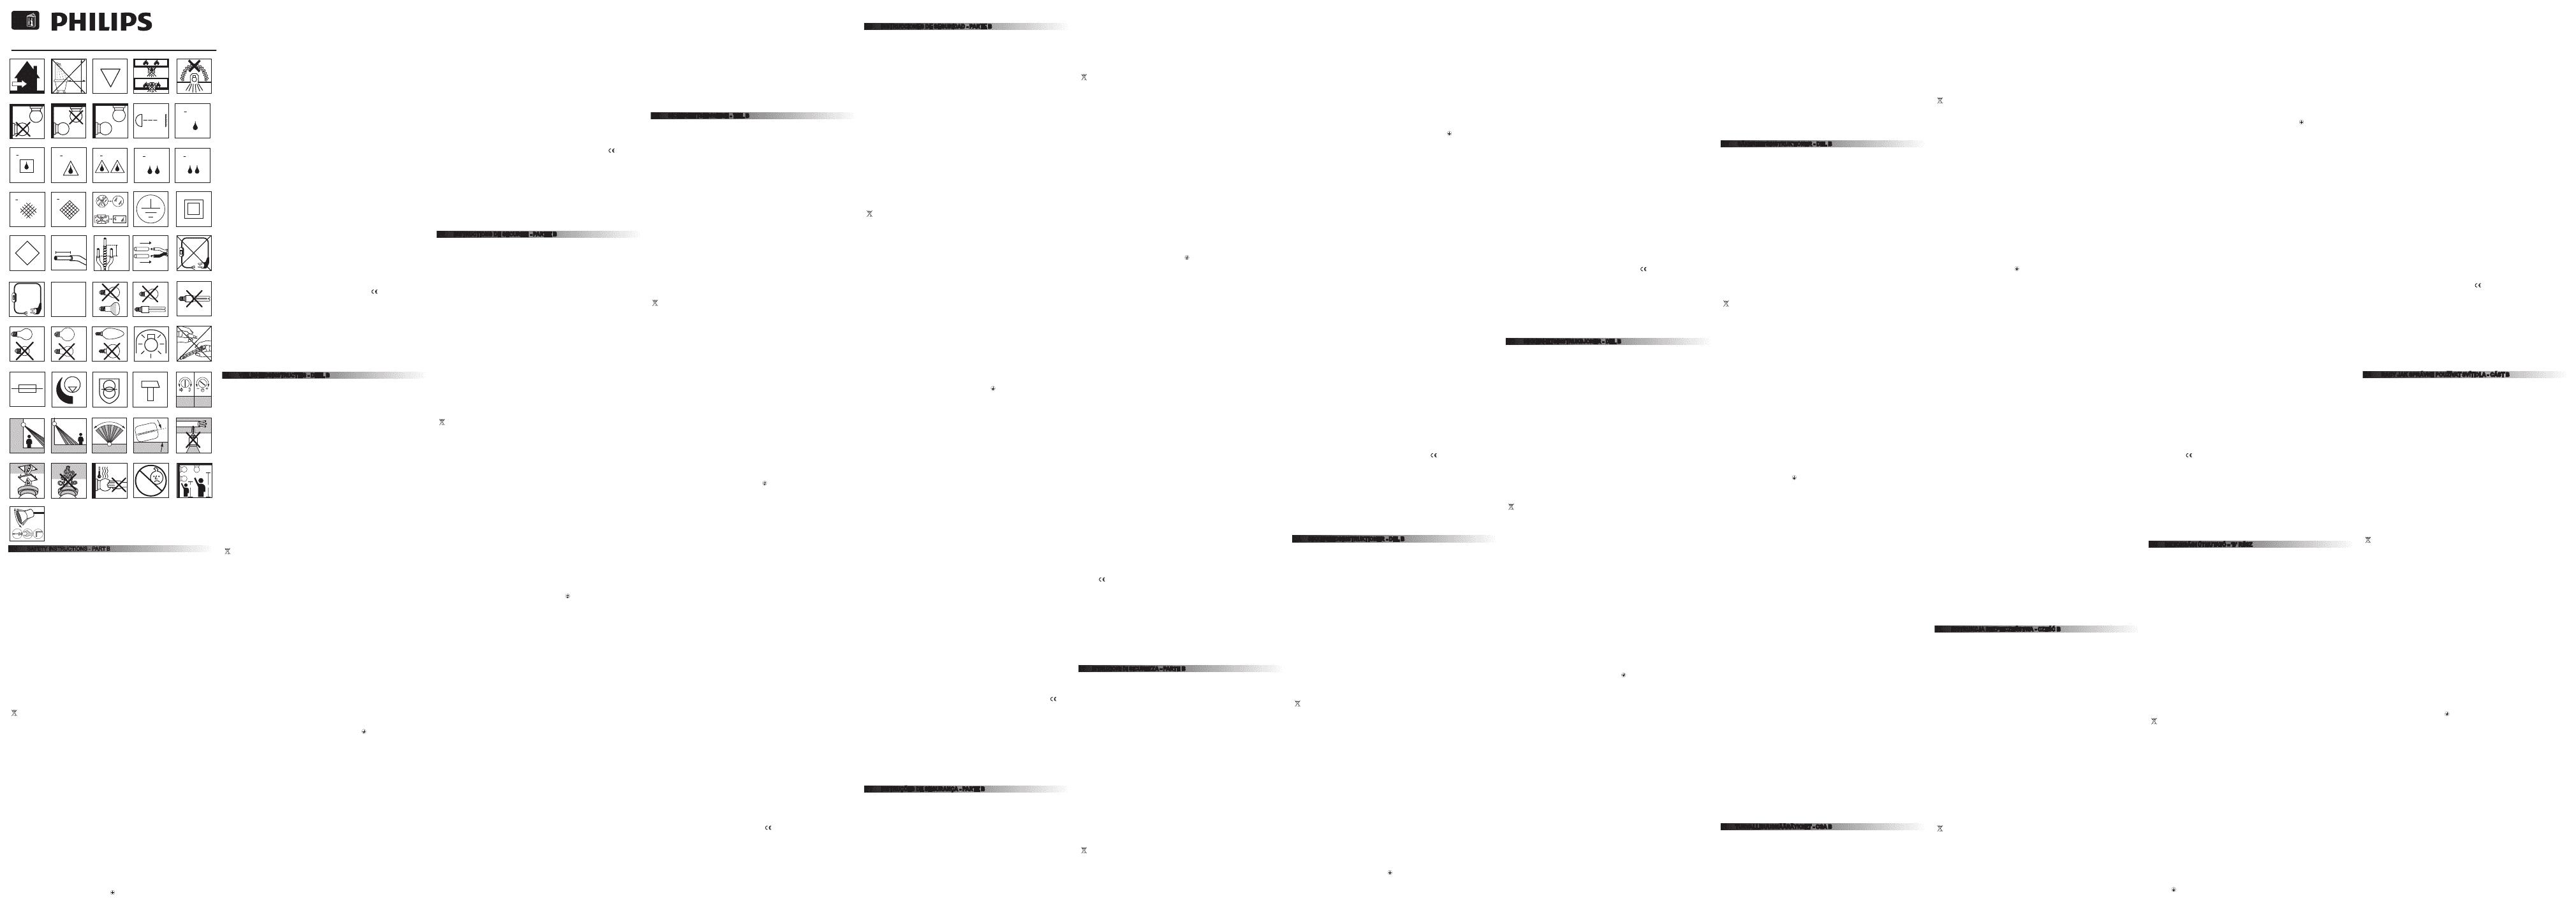 Gebrauchsinformation Datenblatt Zu Philips Mybathroom